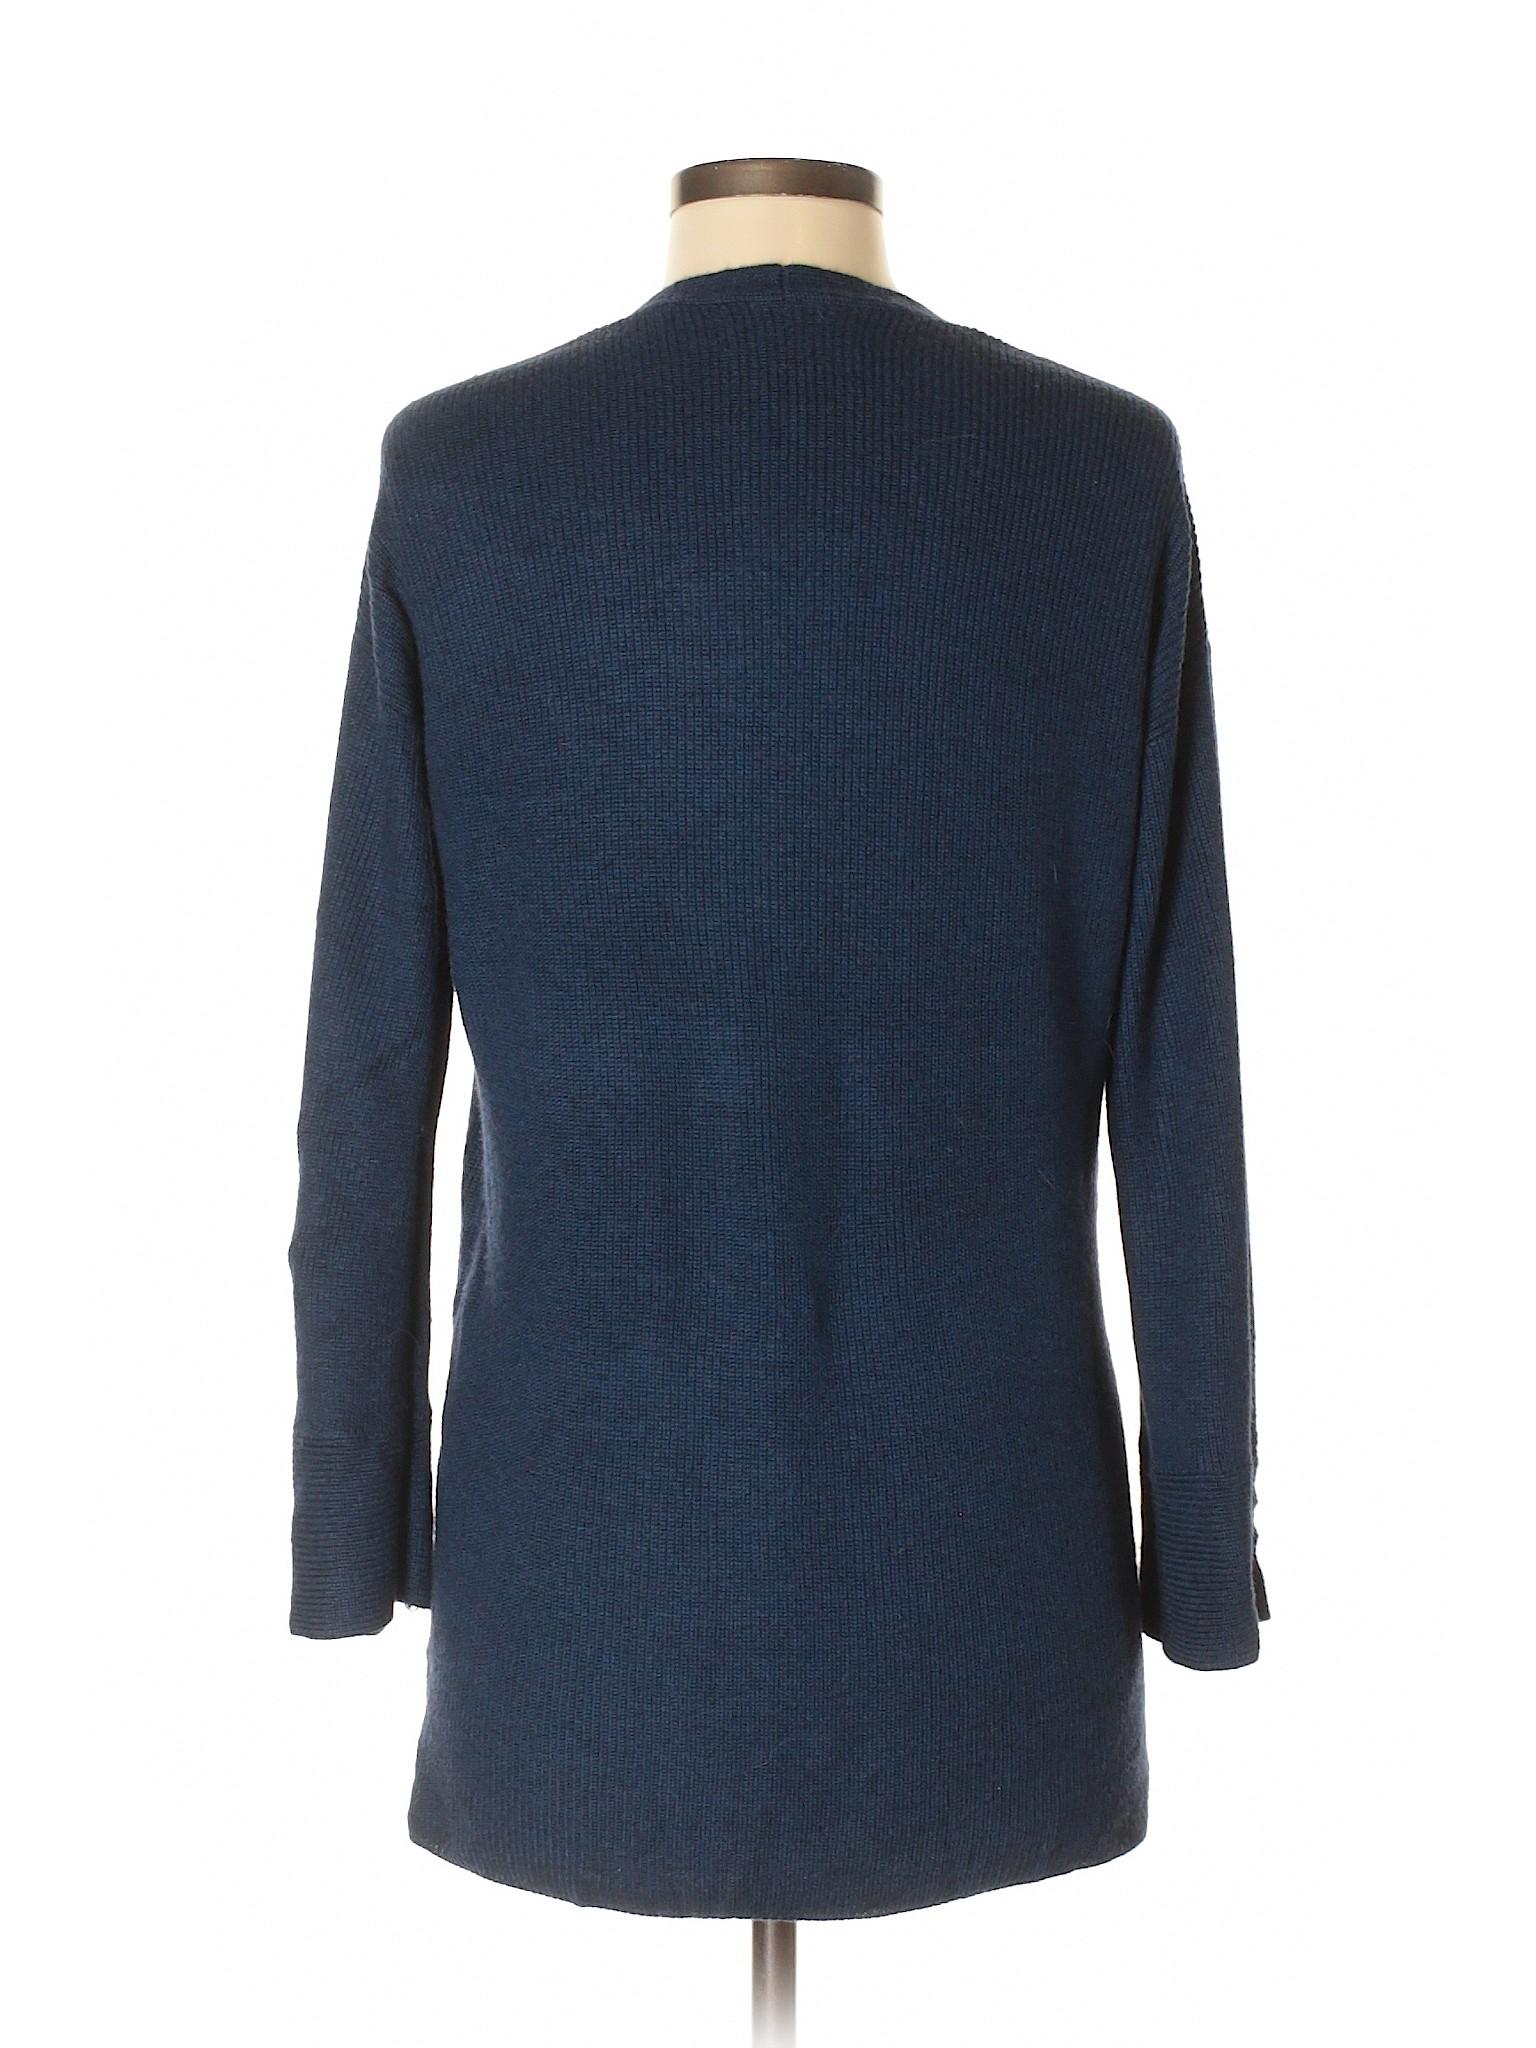 Pullover Joan winter Sweater Vass Boutique Bq7PvTF